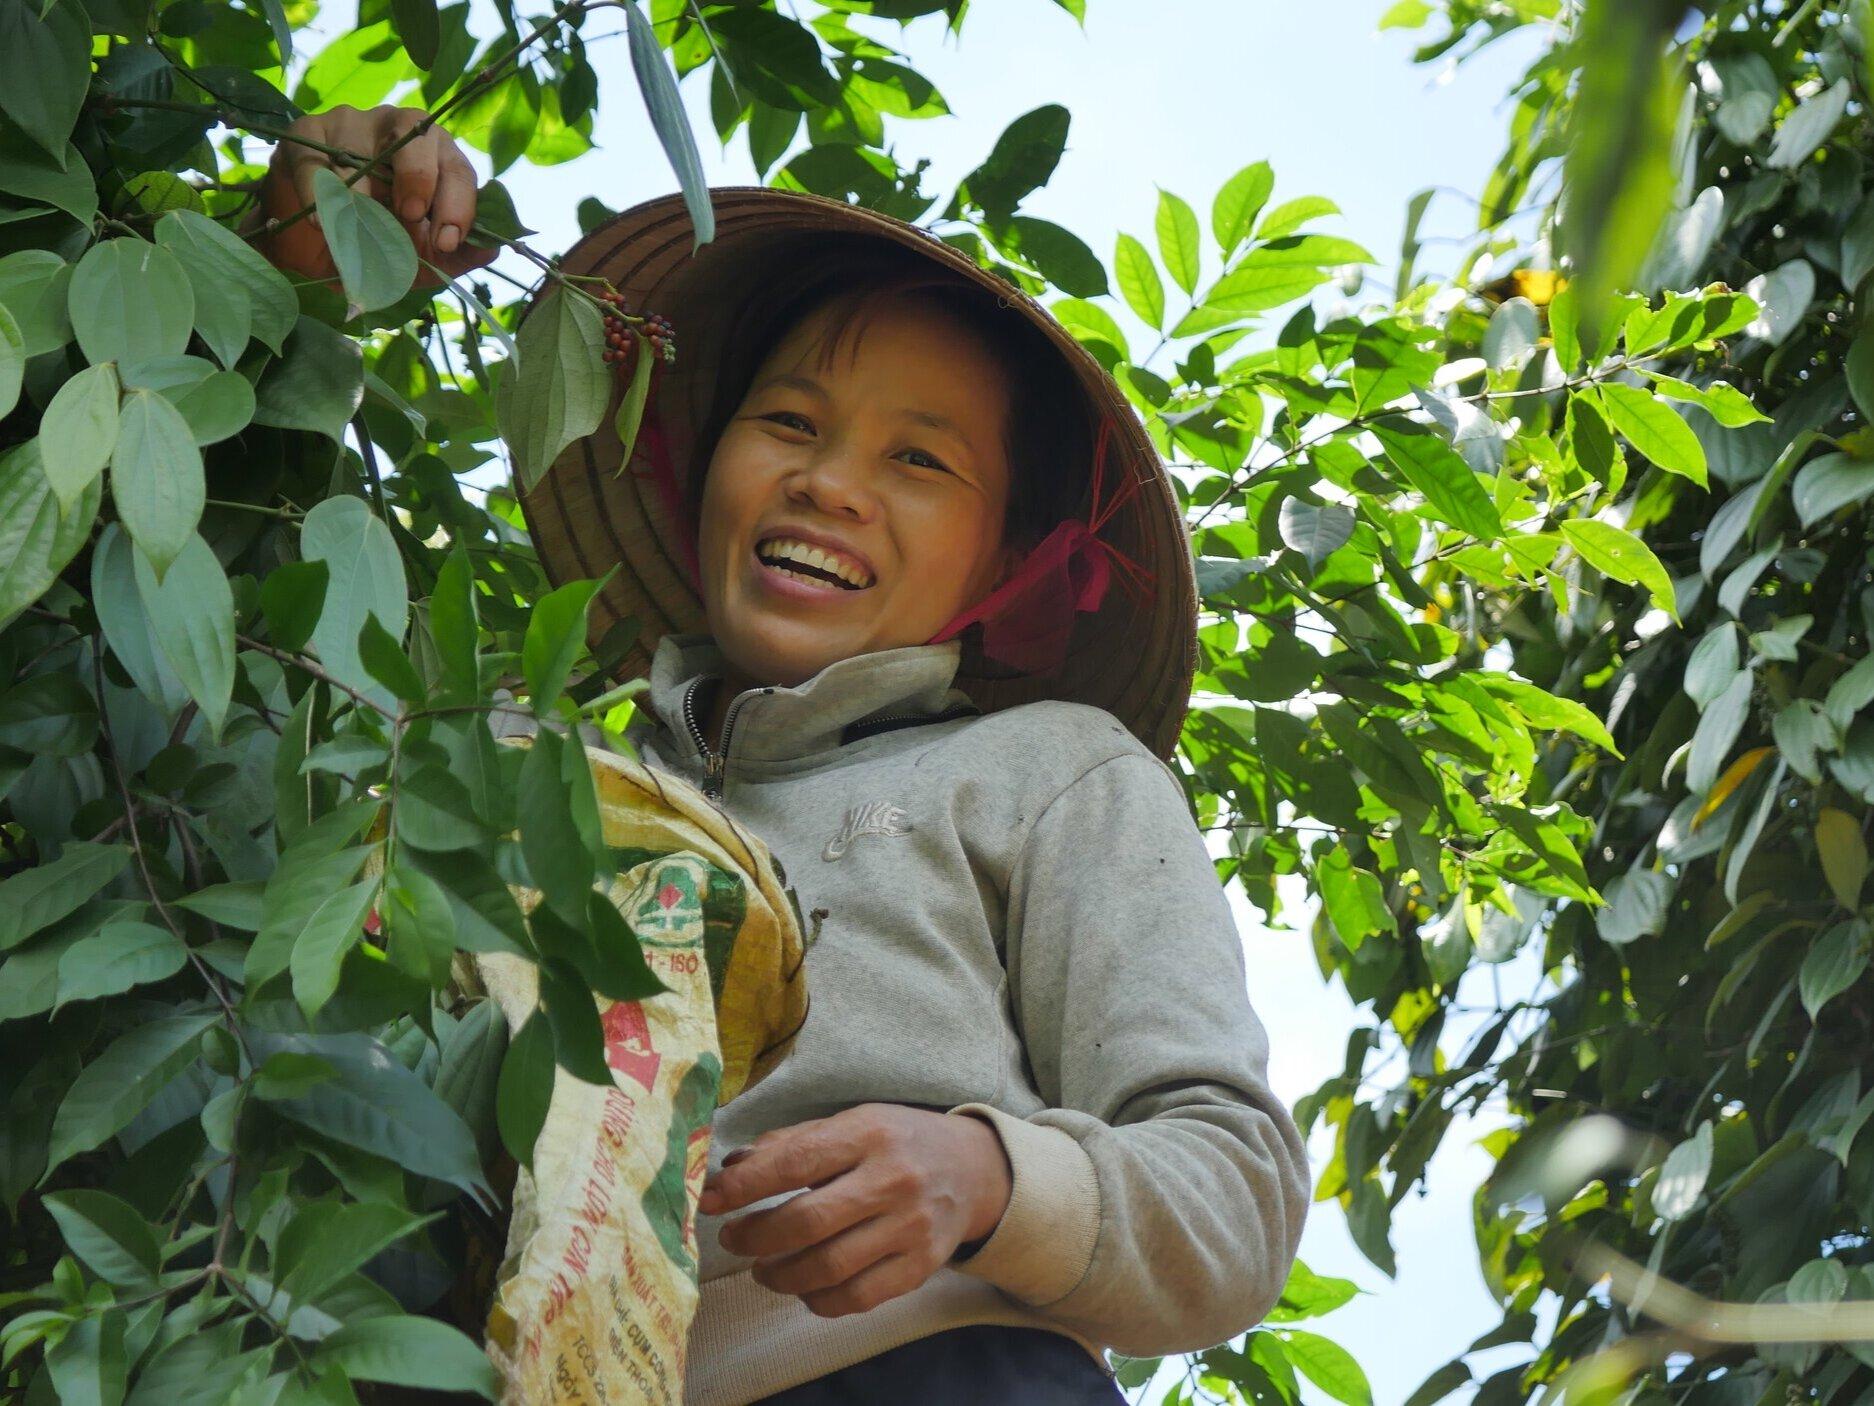 Woman-Farmer-Pepper-Vine-Smile-Vietnam-Roots-of-Peace-ROP